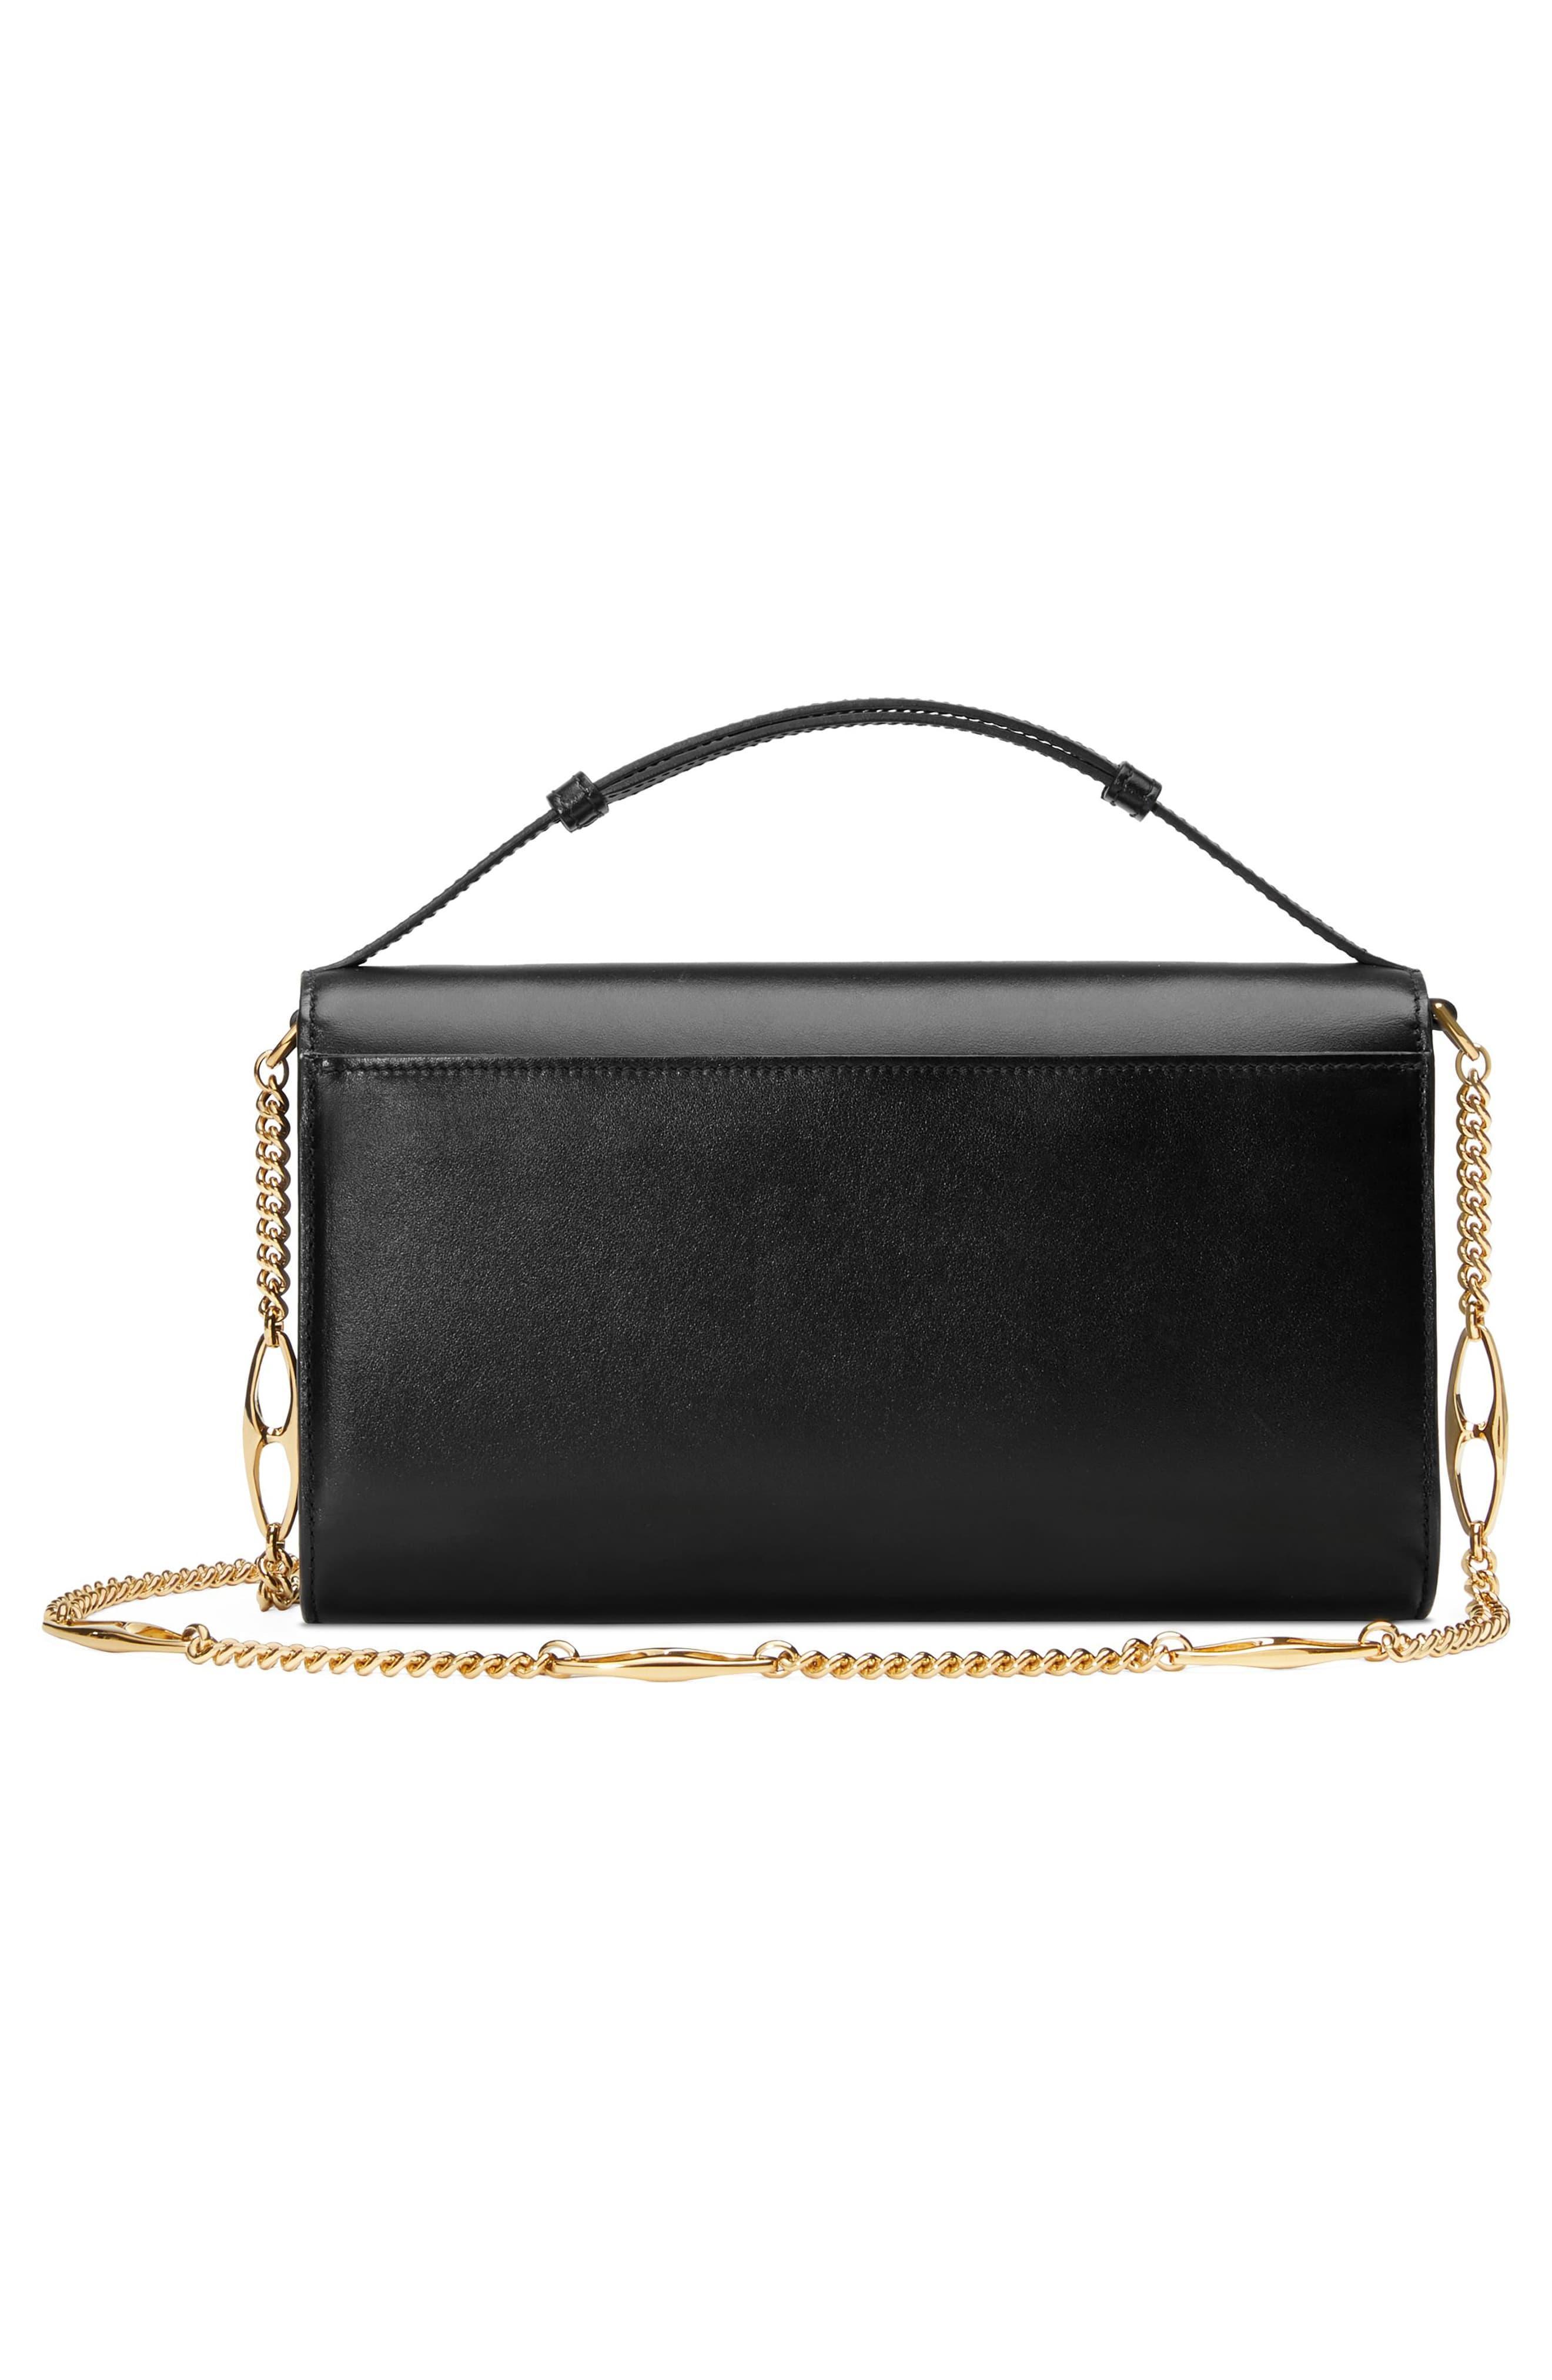 2f36eb31ab53 Gucci - Black Zumi Smooth Leather Small Shoulder Bag - Lyst. View fullscreen